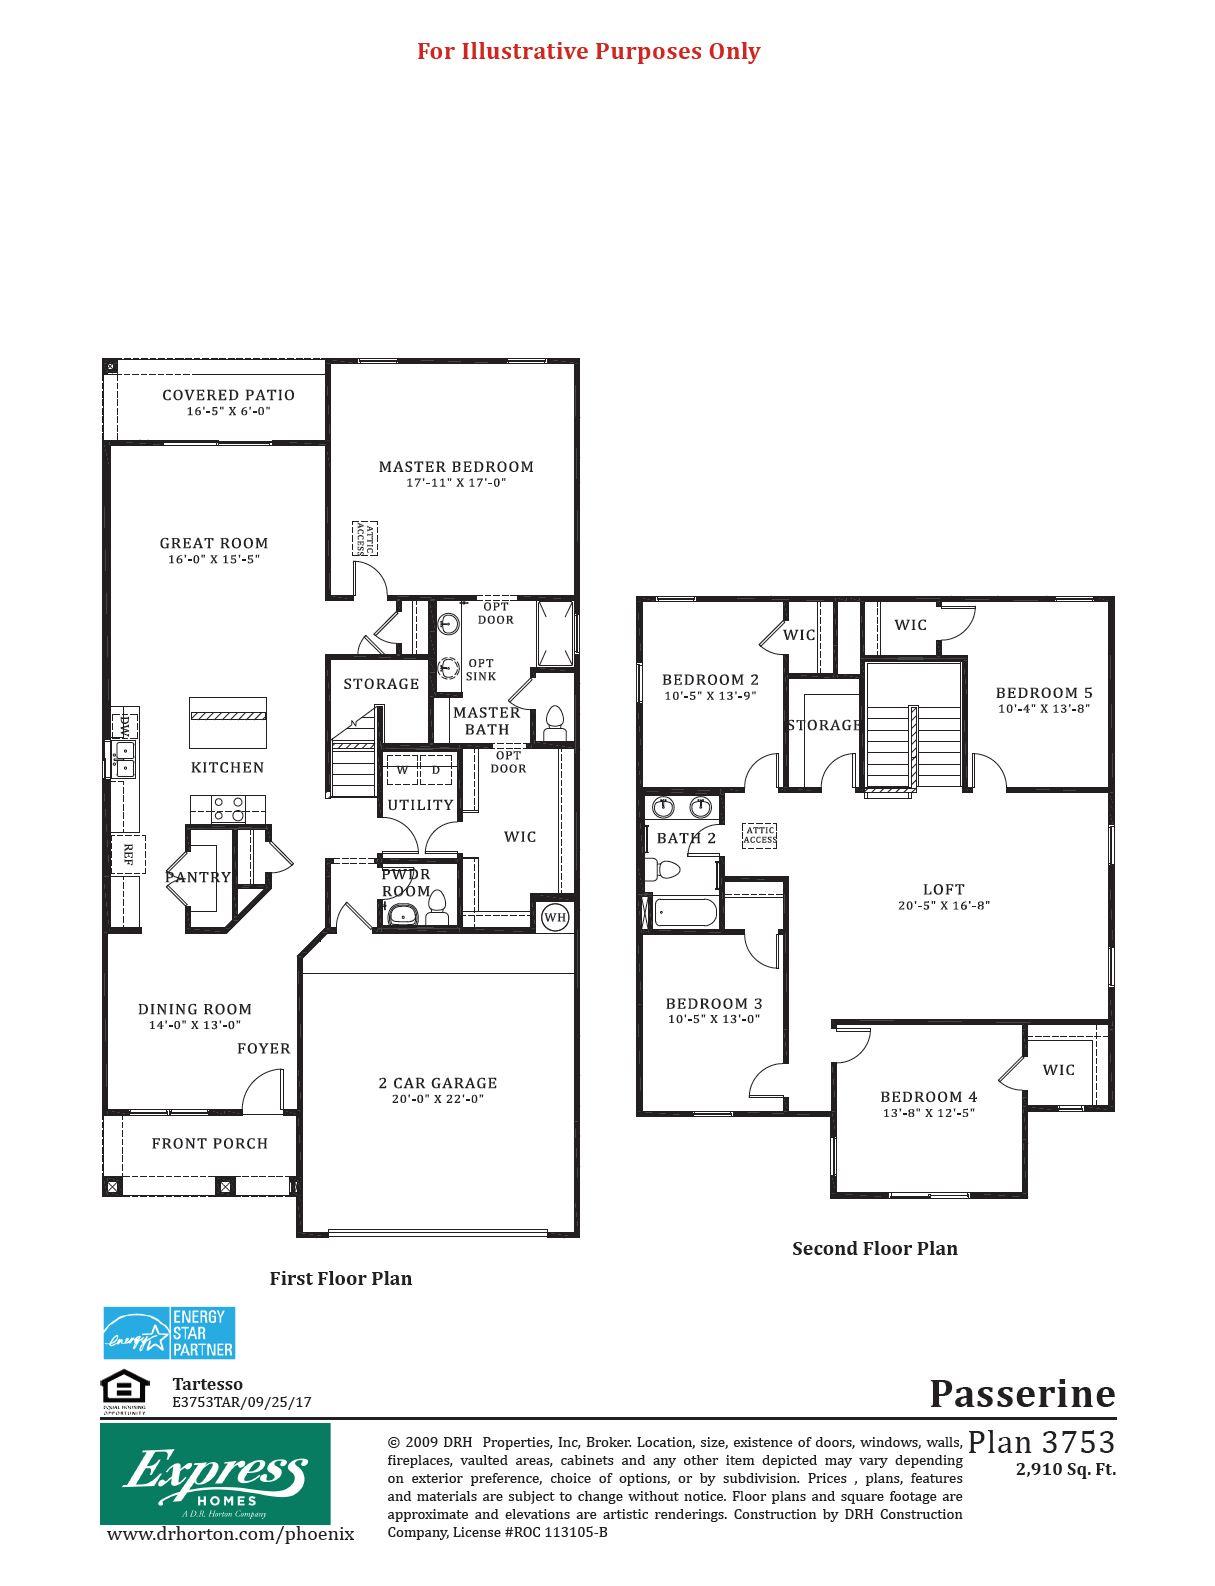 D.R. Horton Tartesso Express Passerine Floor Plan